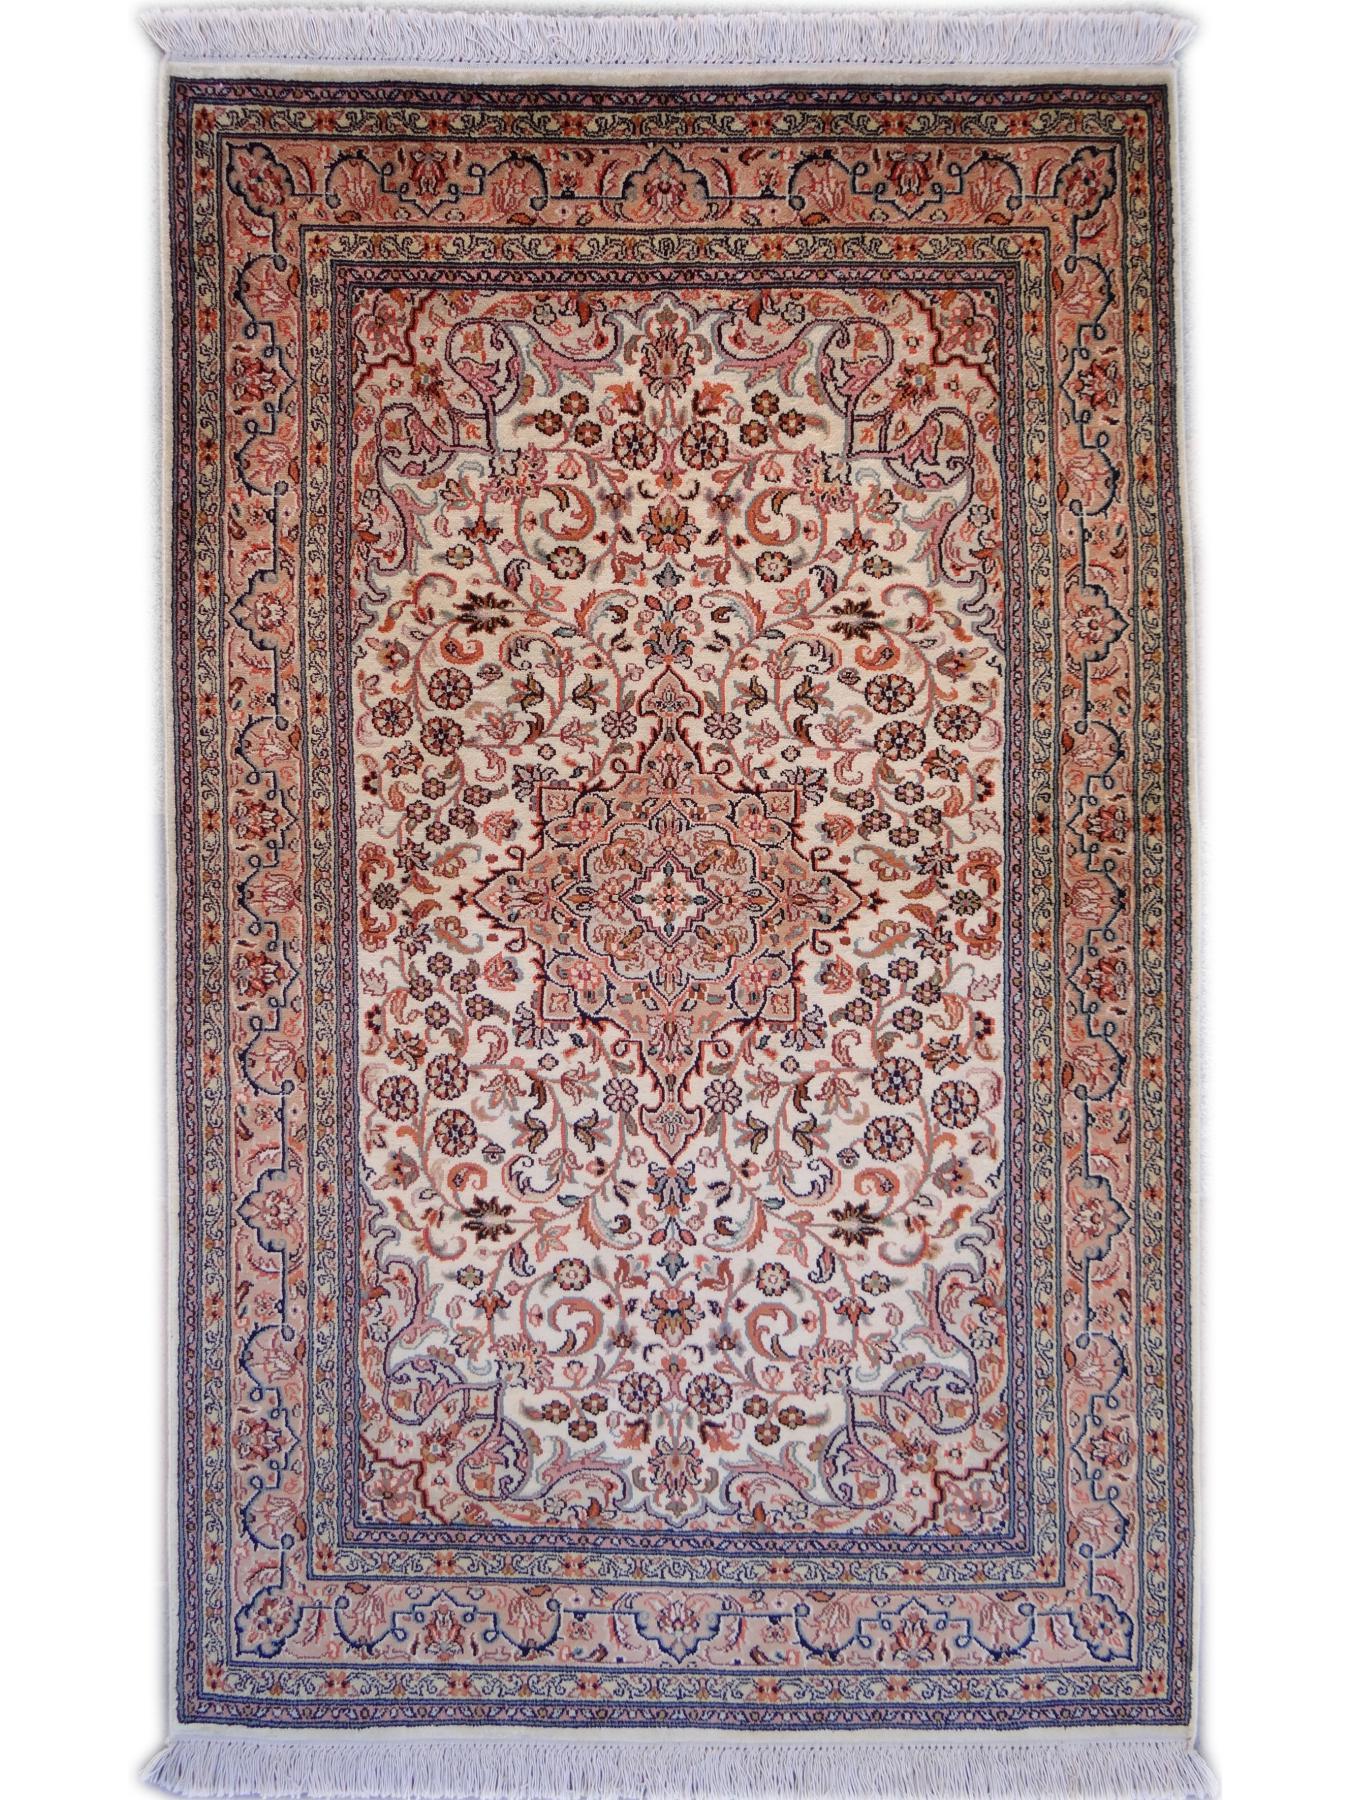 Srinagar Soie Fin Tapis Prestigieux N 26329 130x80cm